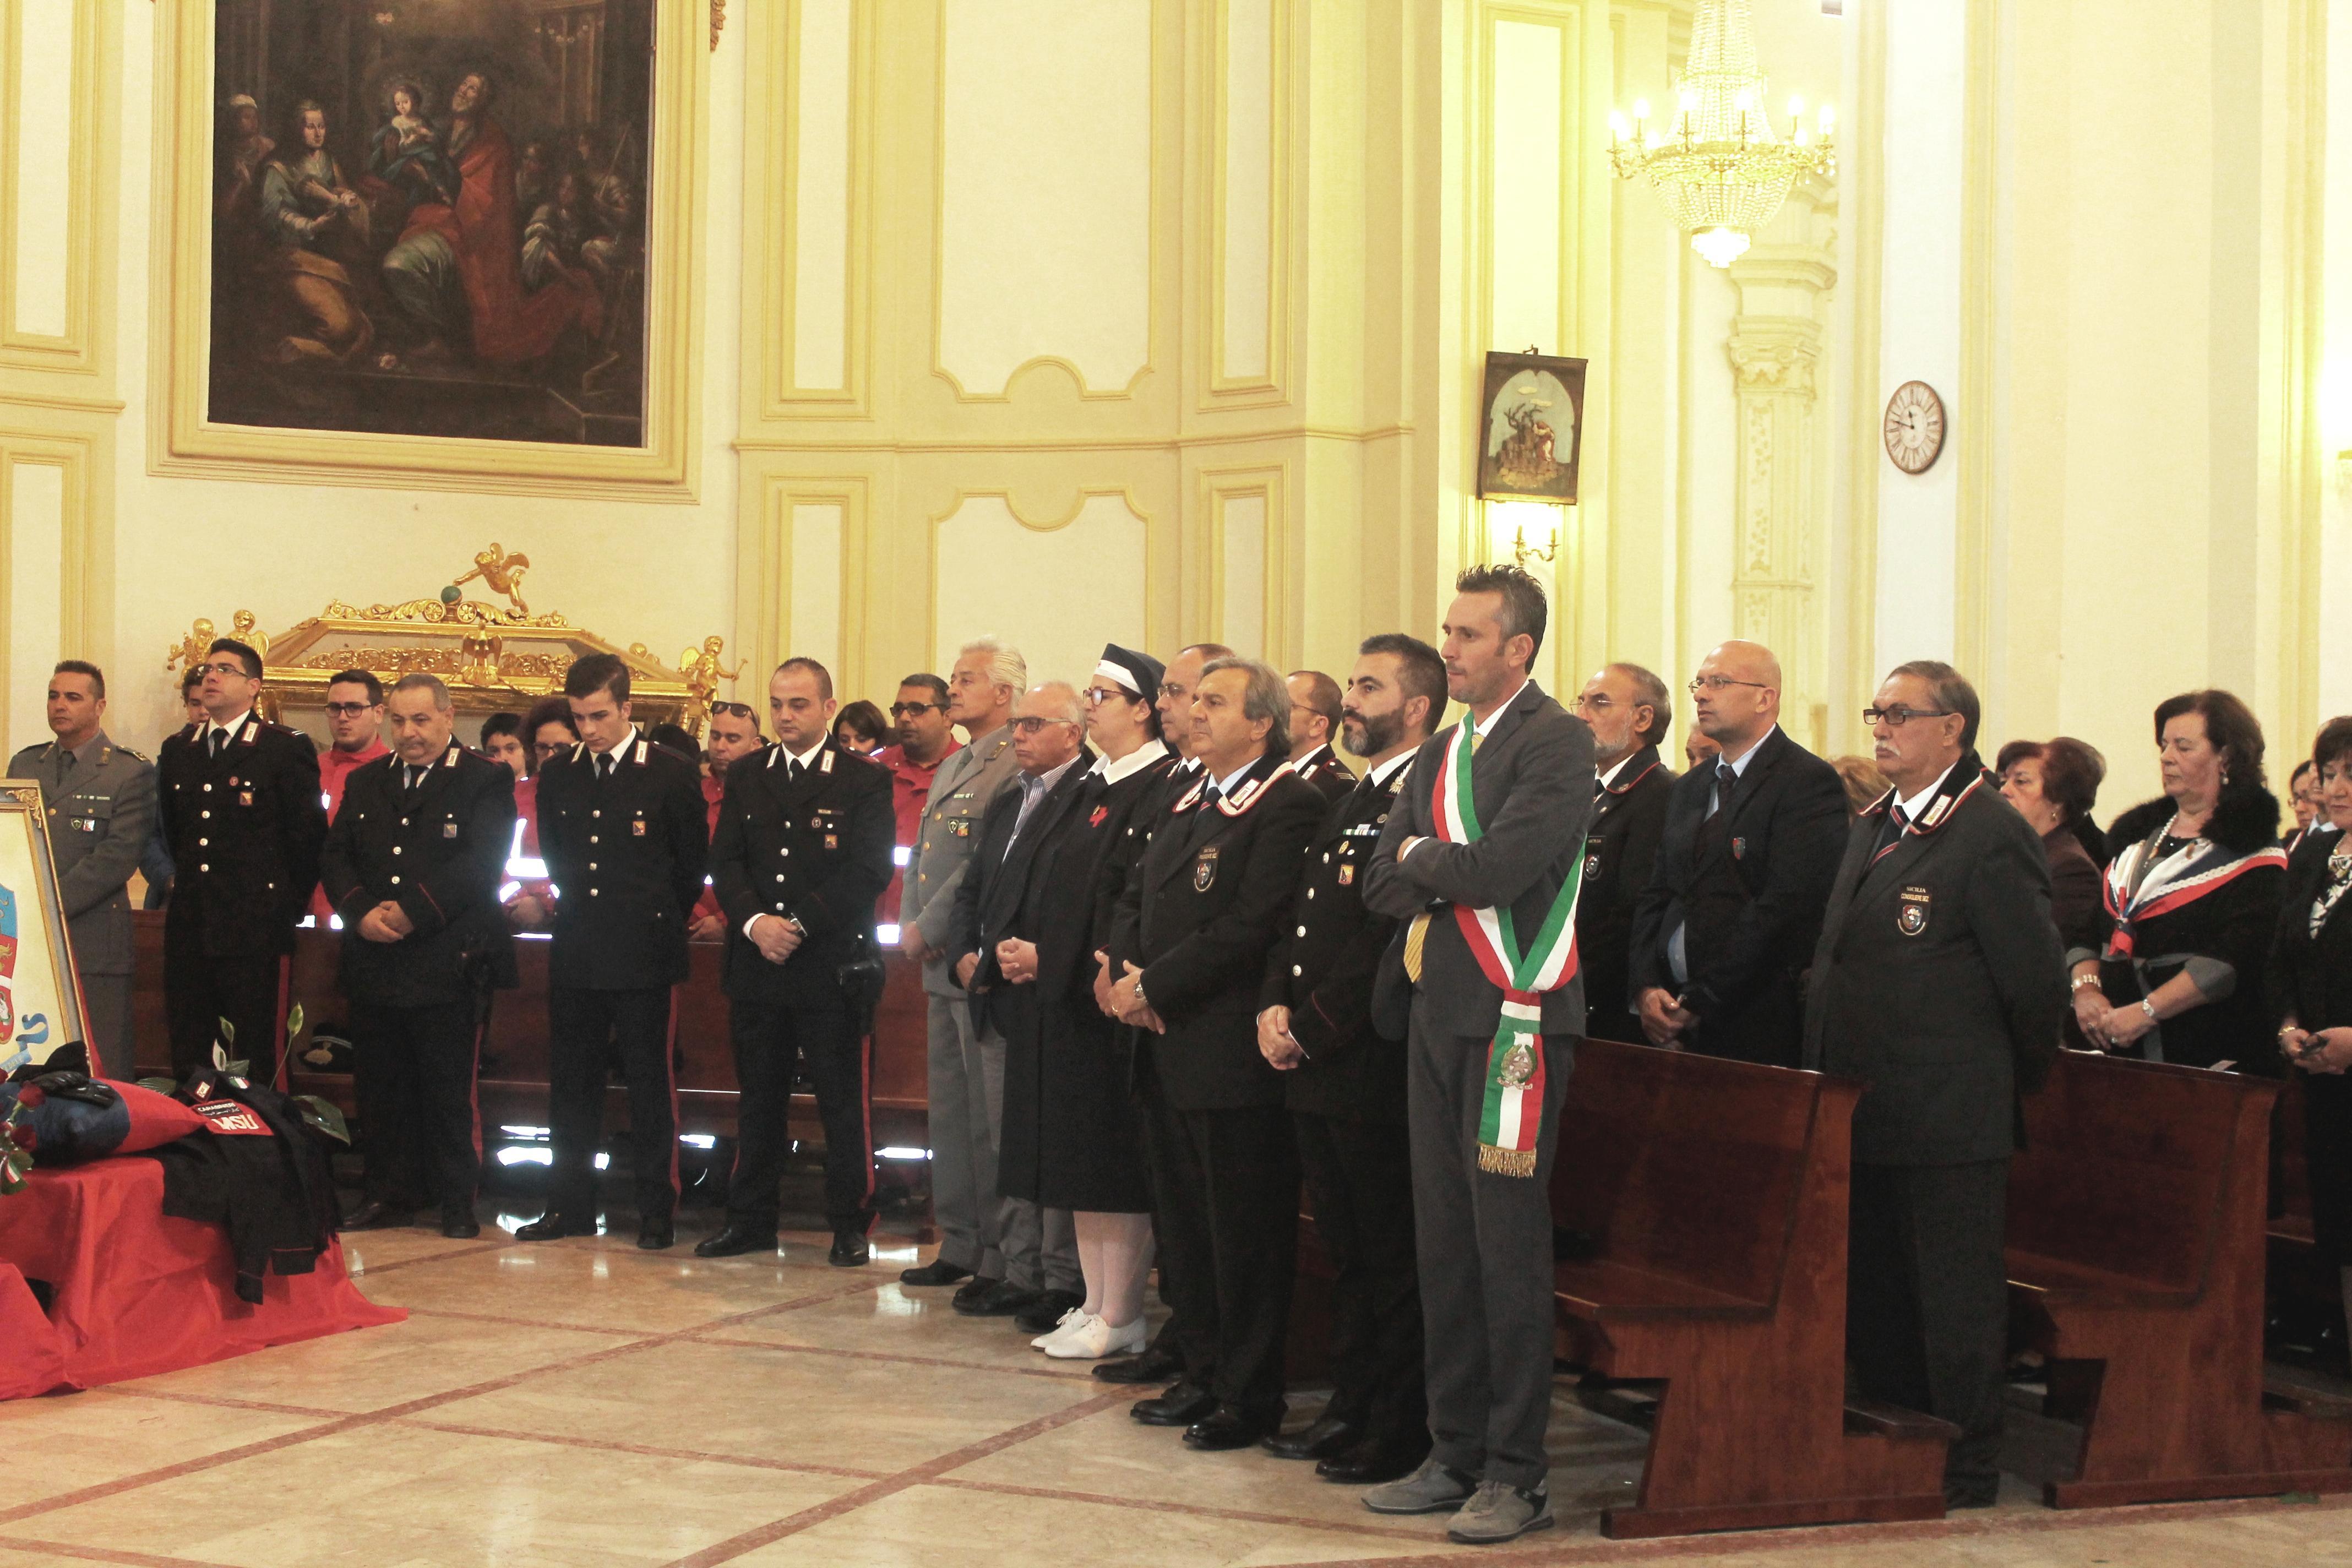 festa carabinieri nassiriya 3